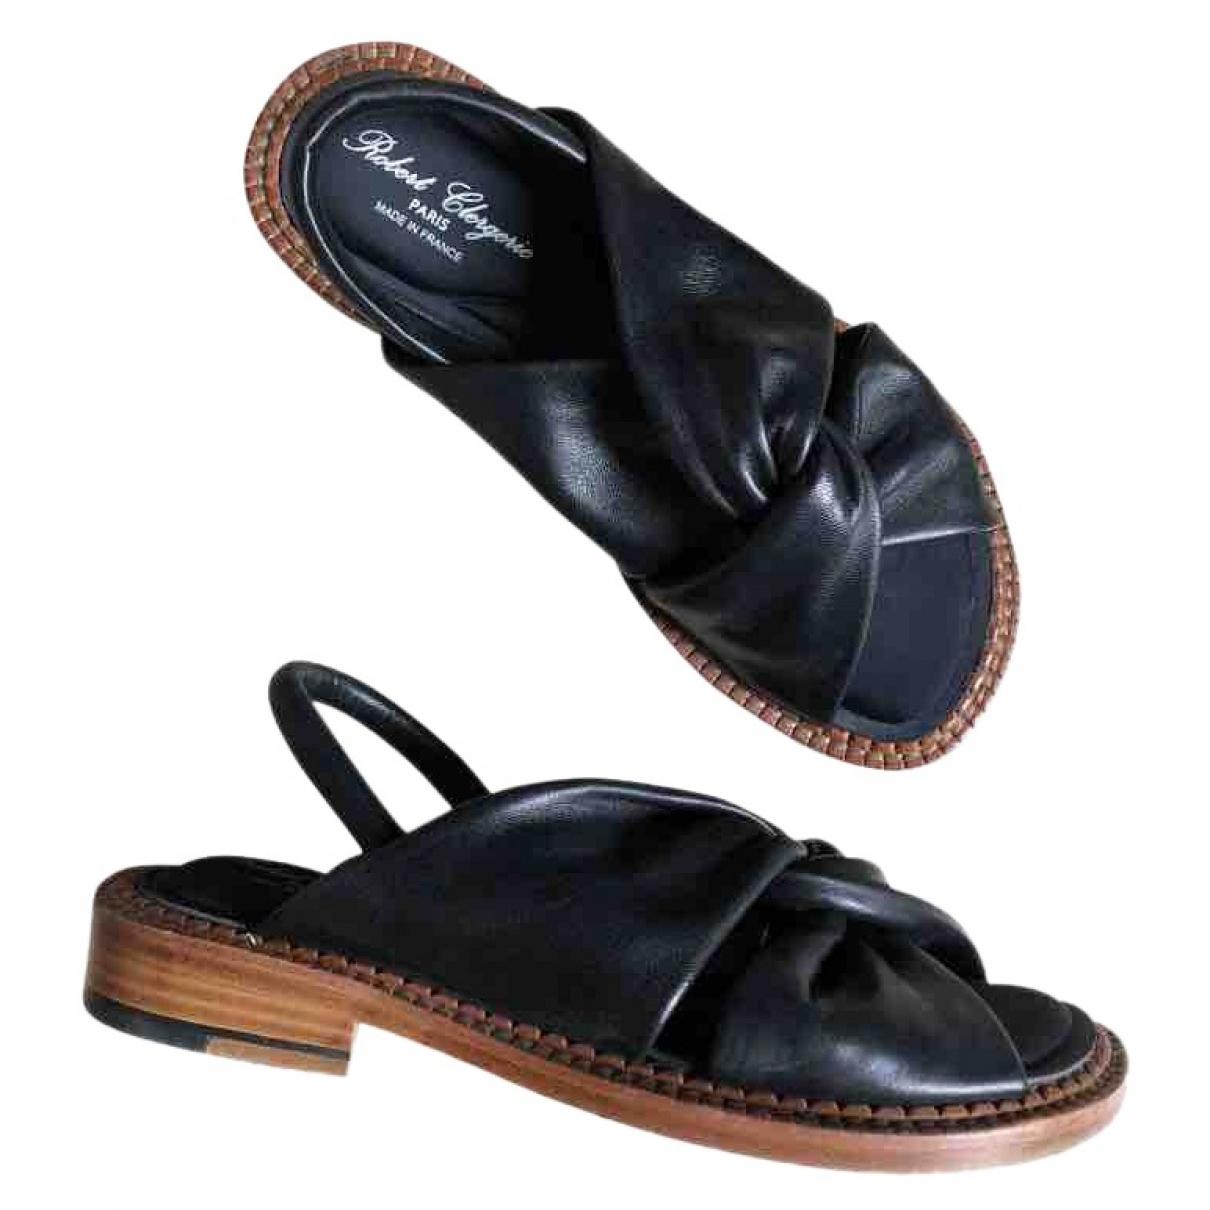 Robert Clergerie \N Black Leather Sandals for Women 37 EU